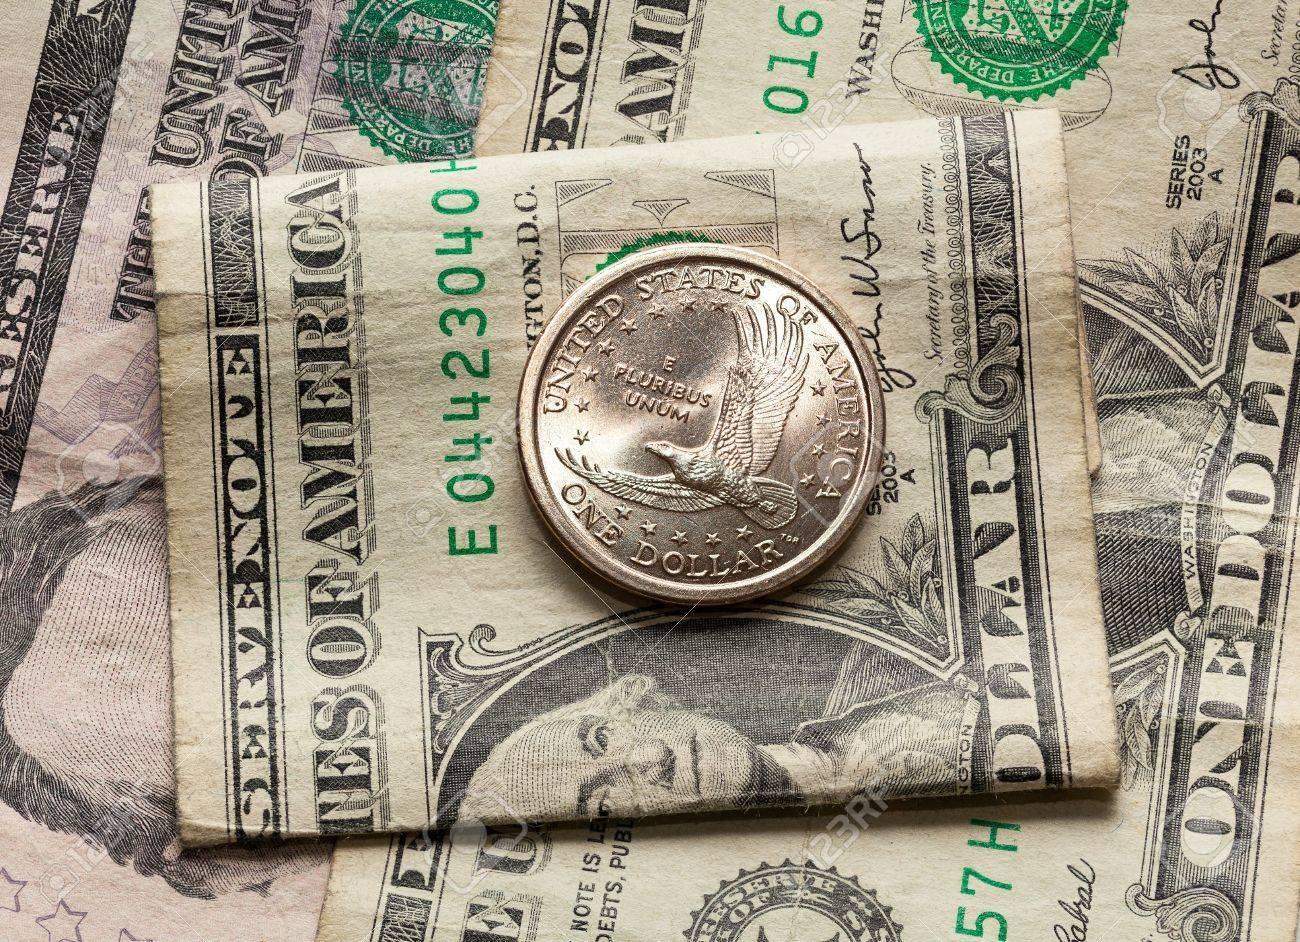 2020 pay raise, retiree COLA TBD | Federal News Network